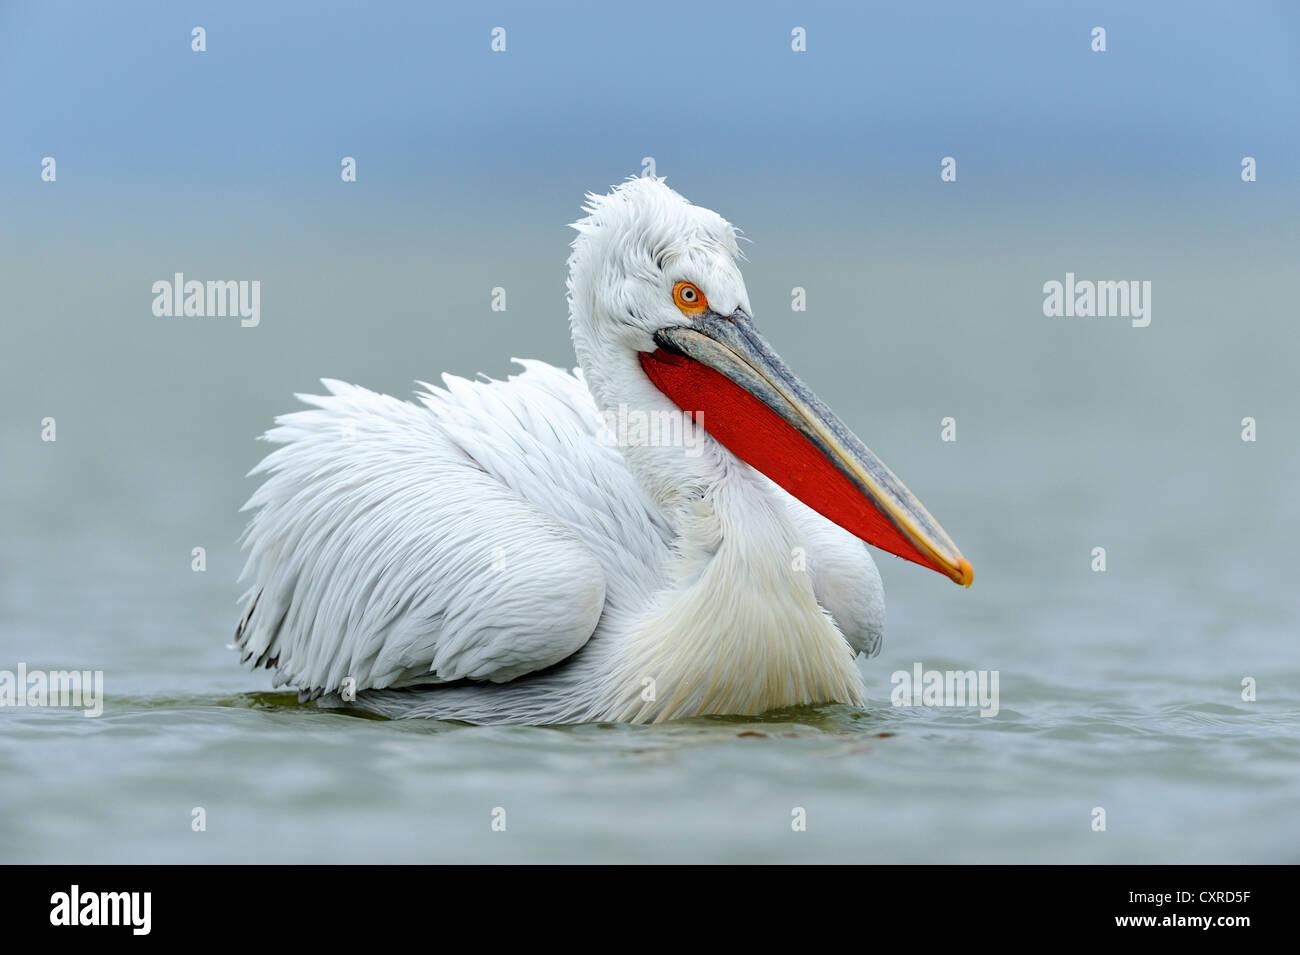 Dalmatian Pelican (Pelecanus crispus), Lake Kerkini, Greece, Europe - Stock Image